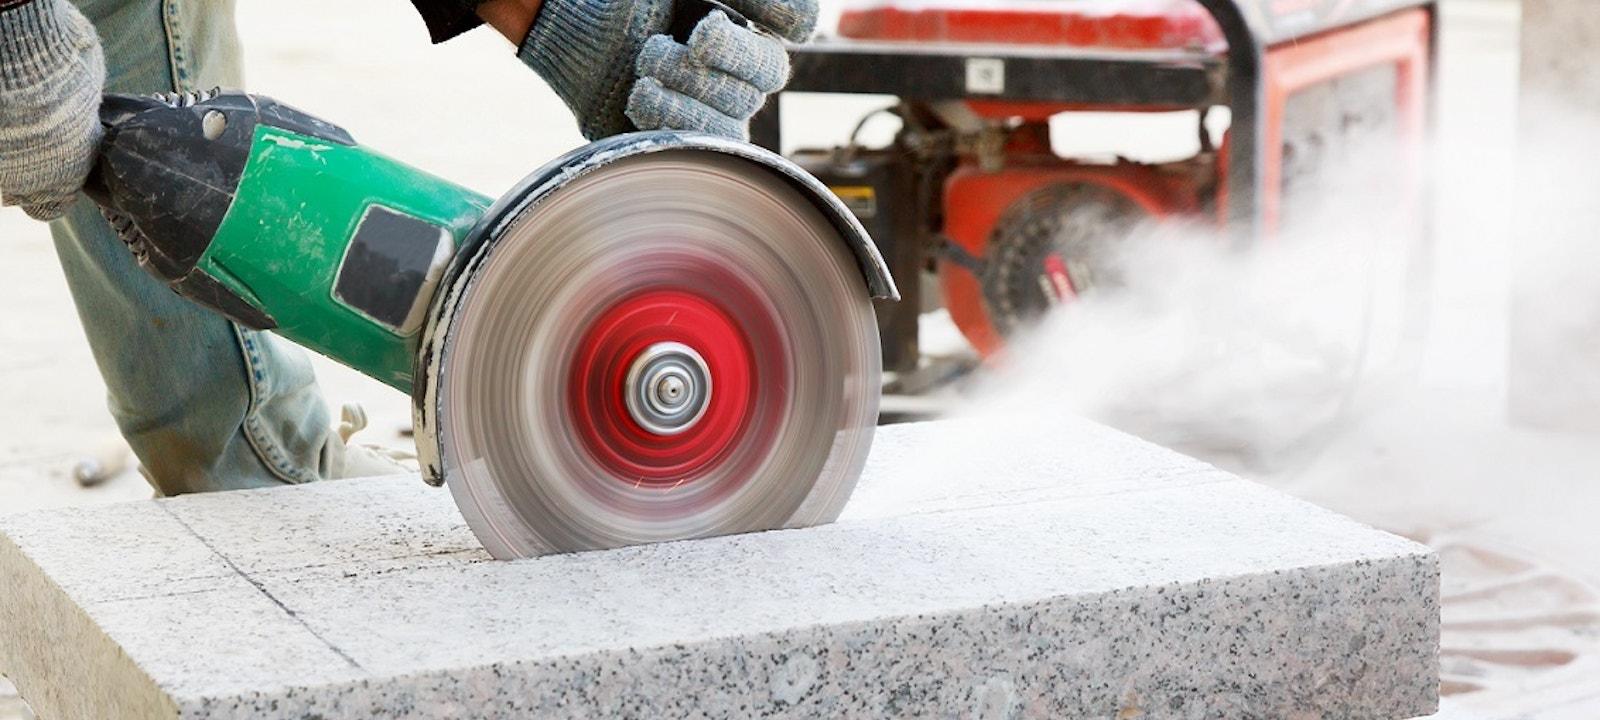 Silica cutting into engineered stone